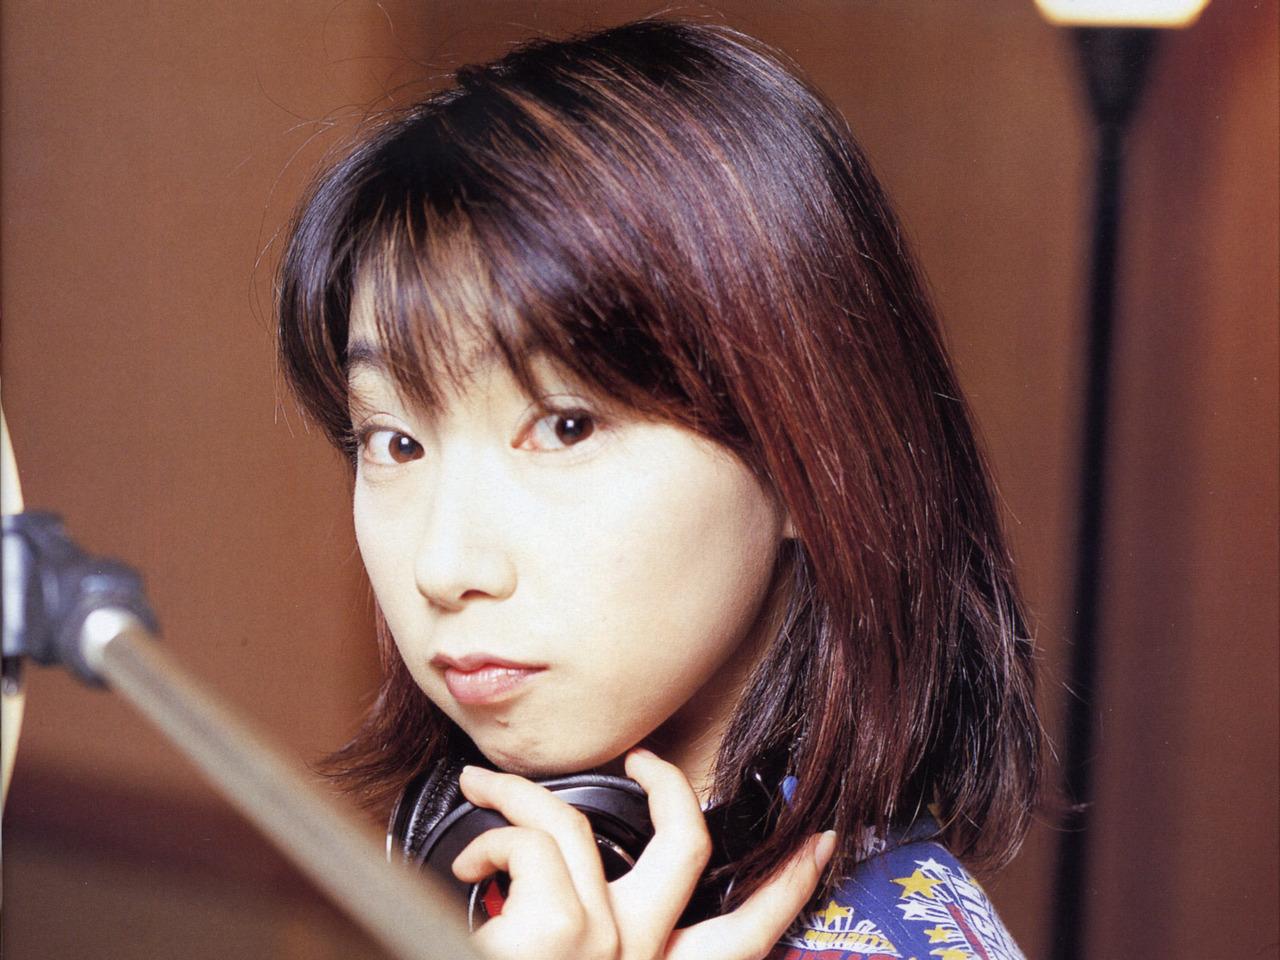 宮村優子 (声優)の画像 p1_36